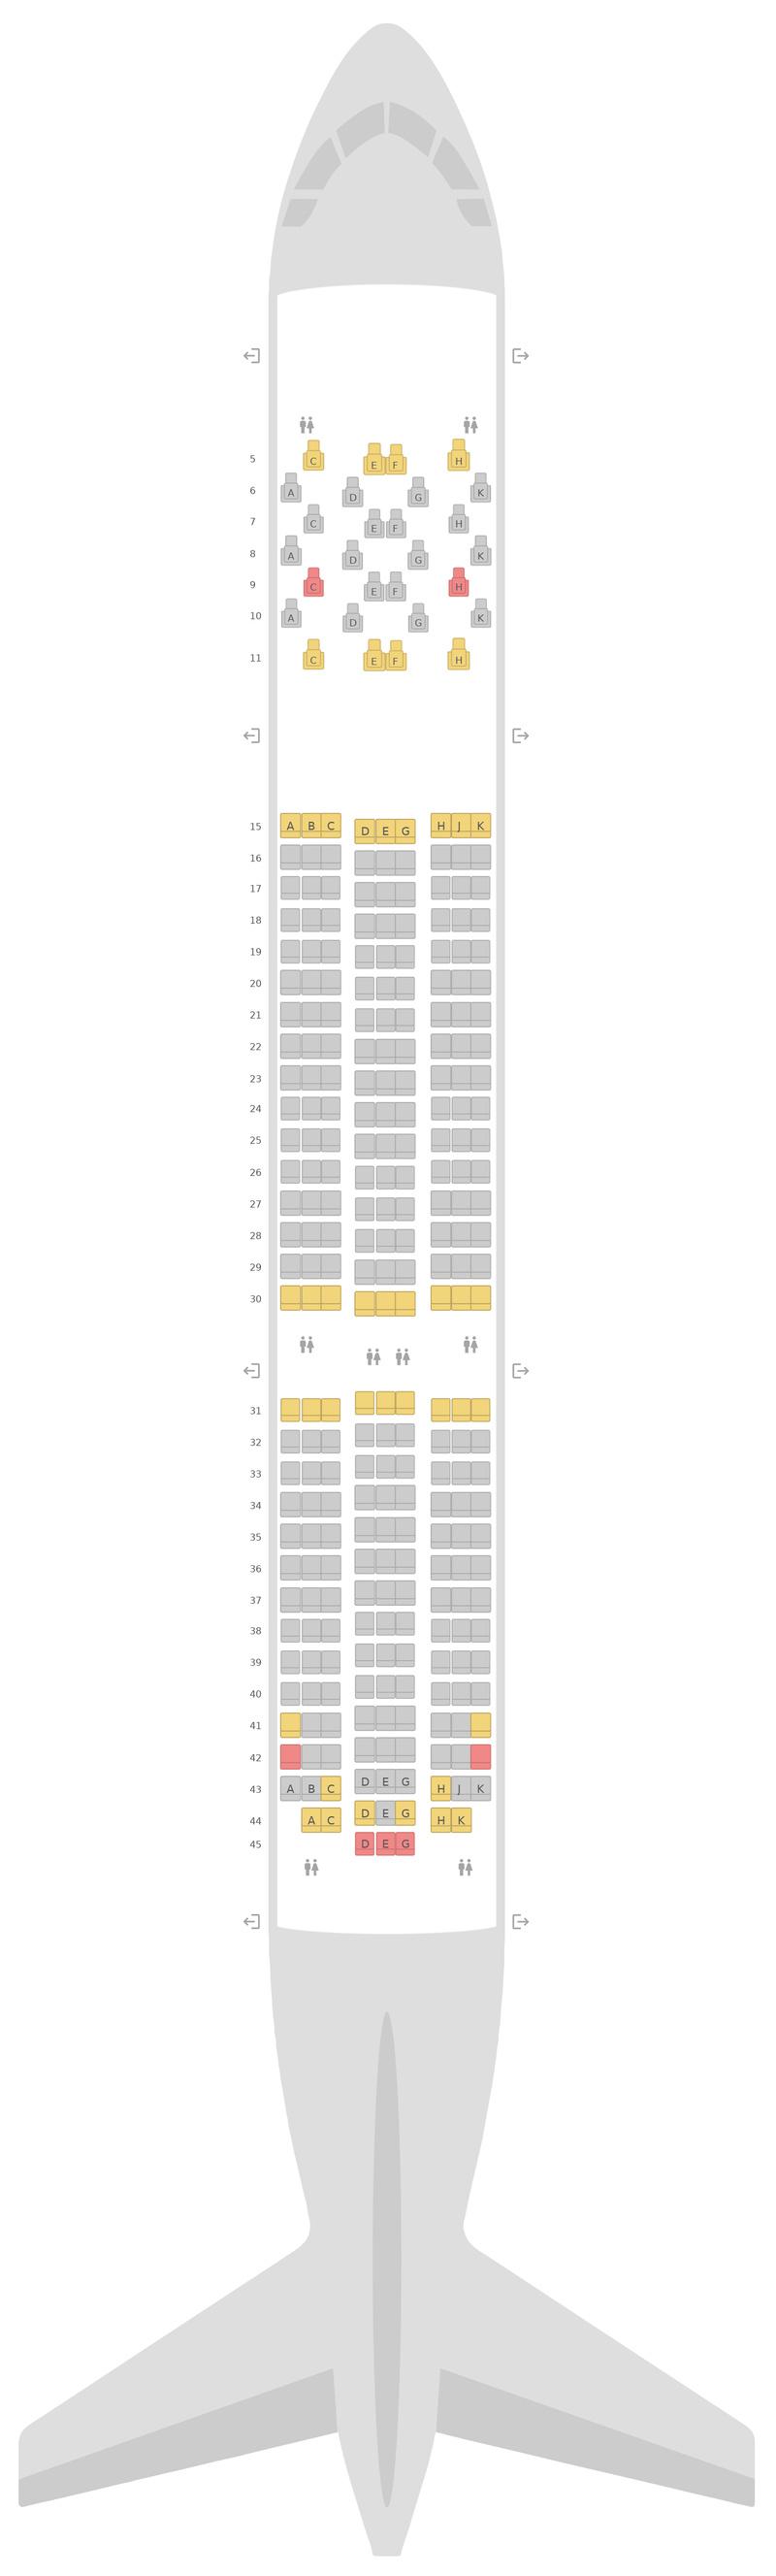 Seat Map Boeing 787-9 (789) 2 Class Etihad Airways